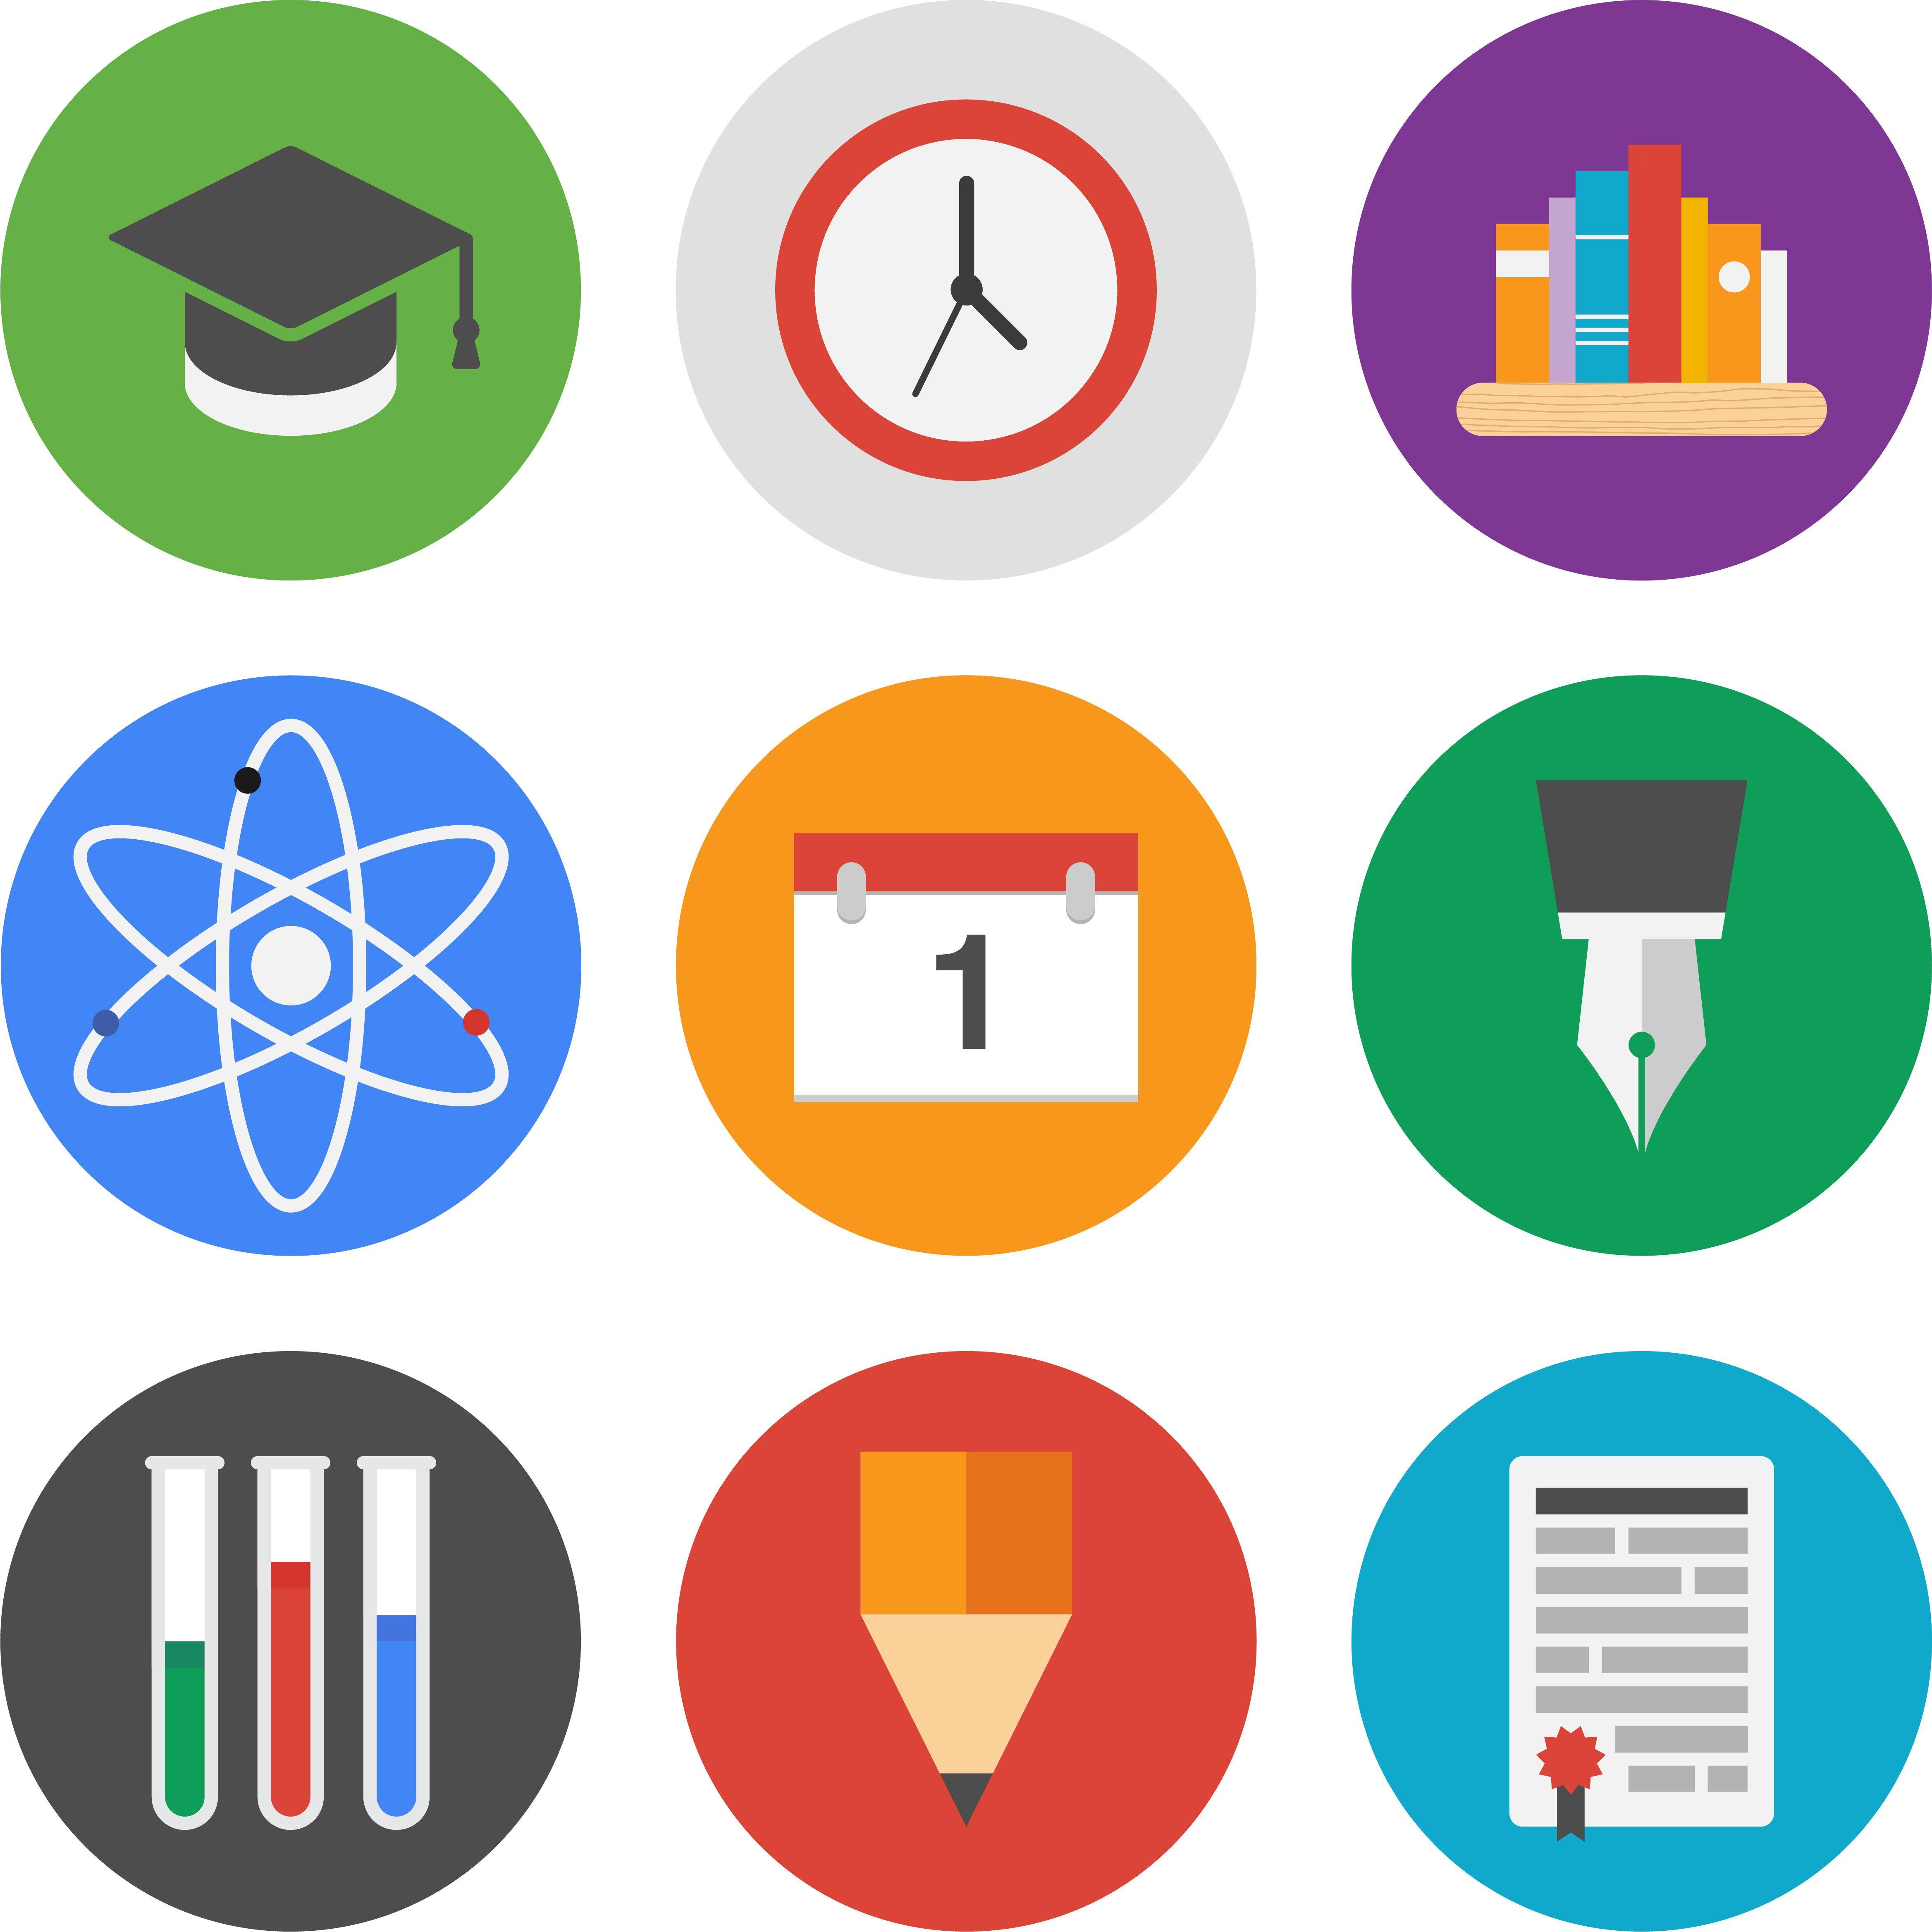 Best Majors For Law School >> Best Majors For Law School Education Education Icon